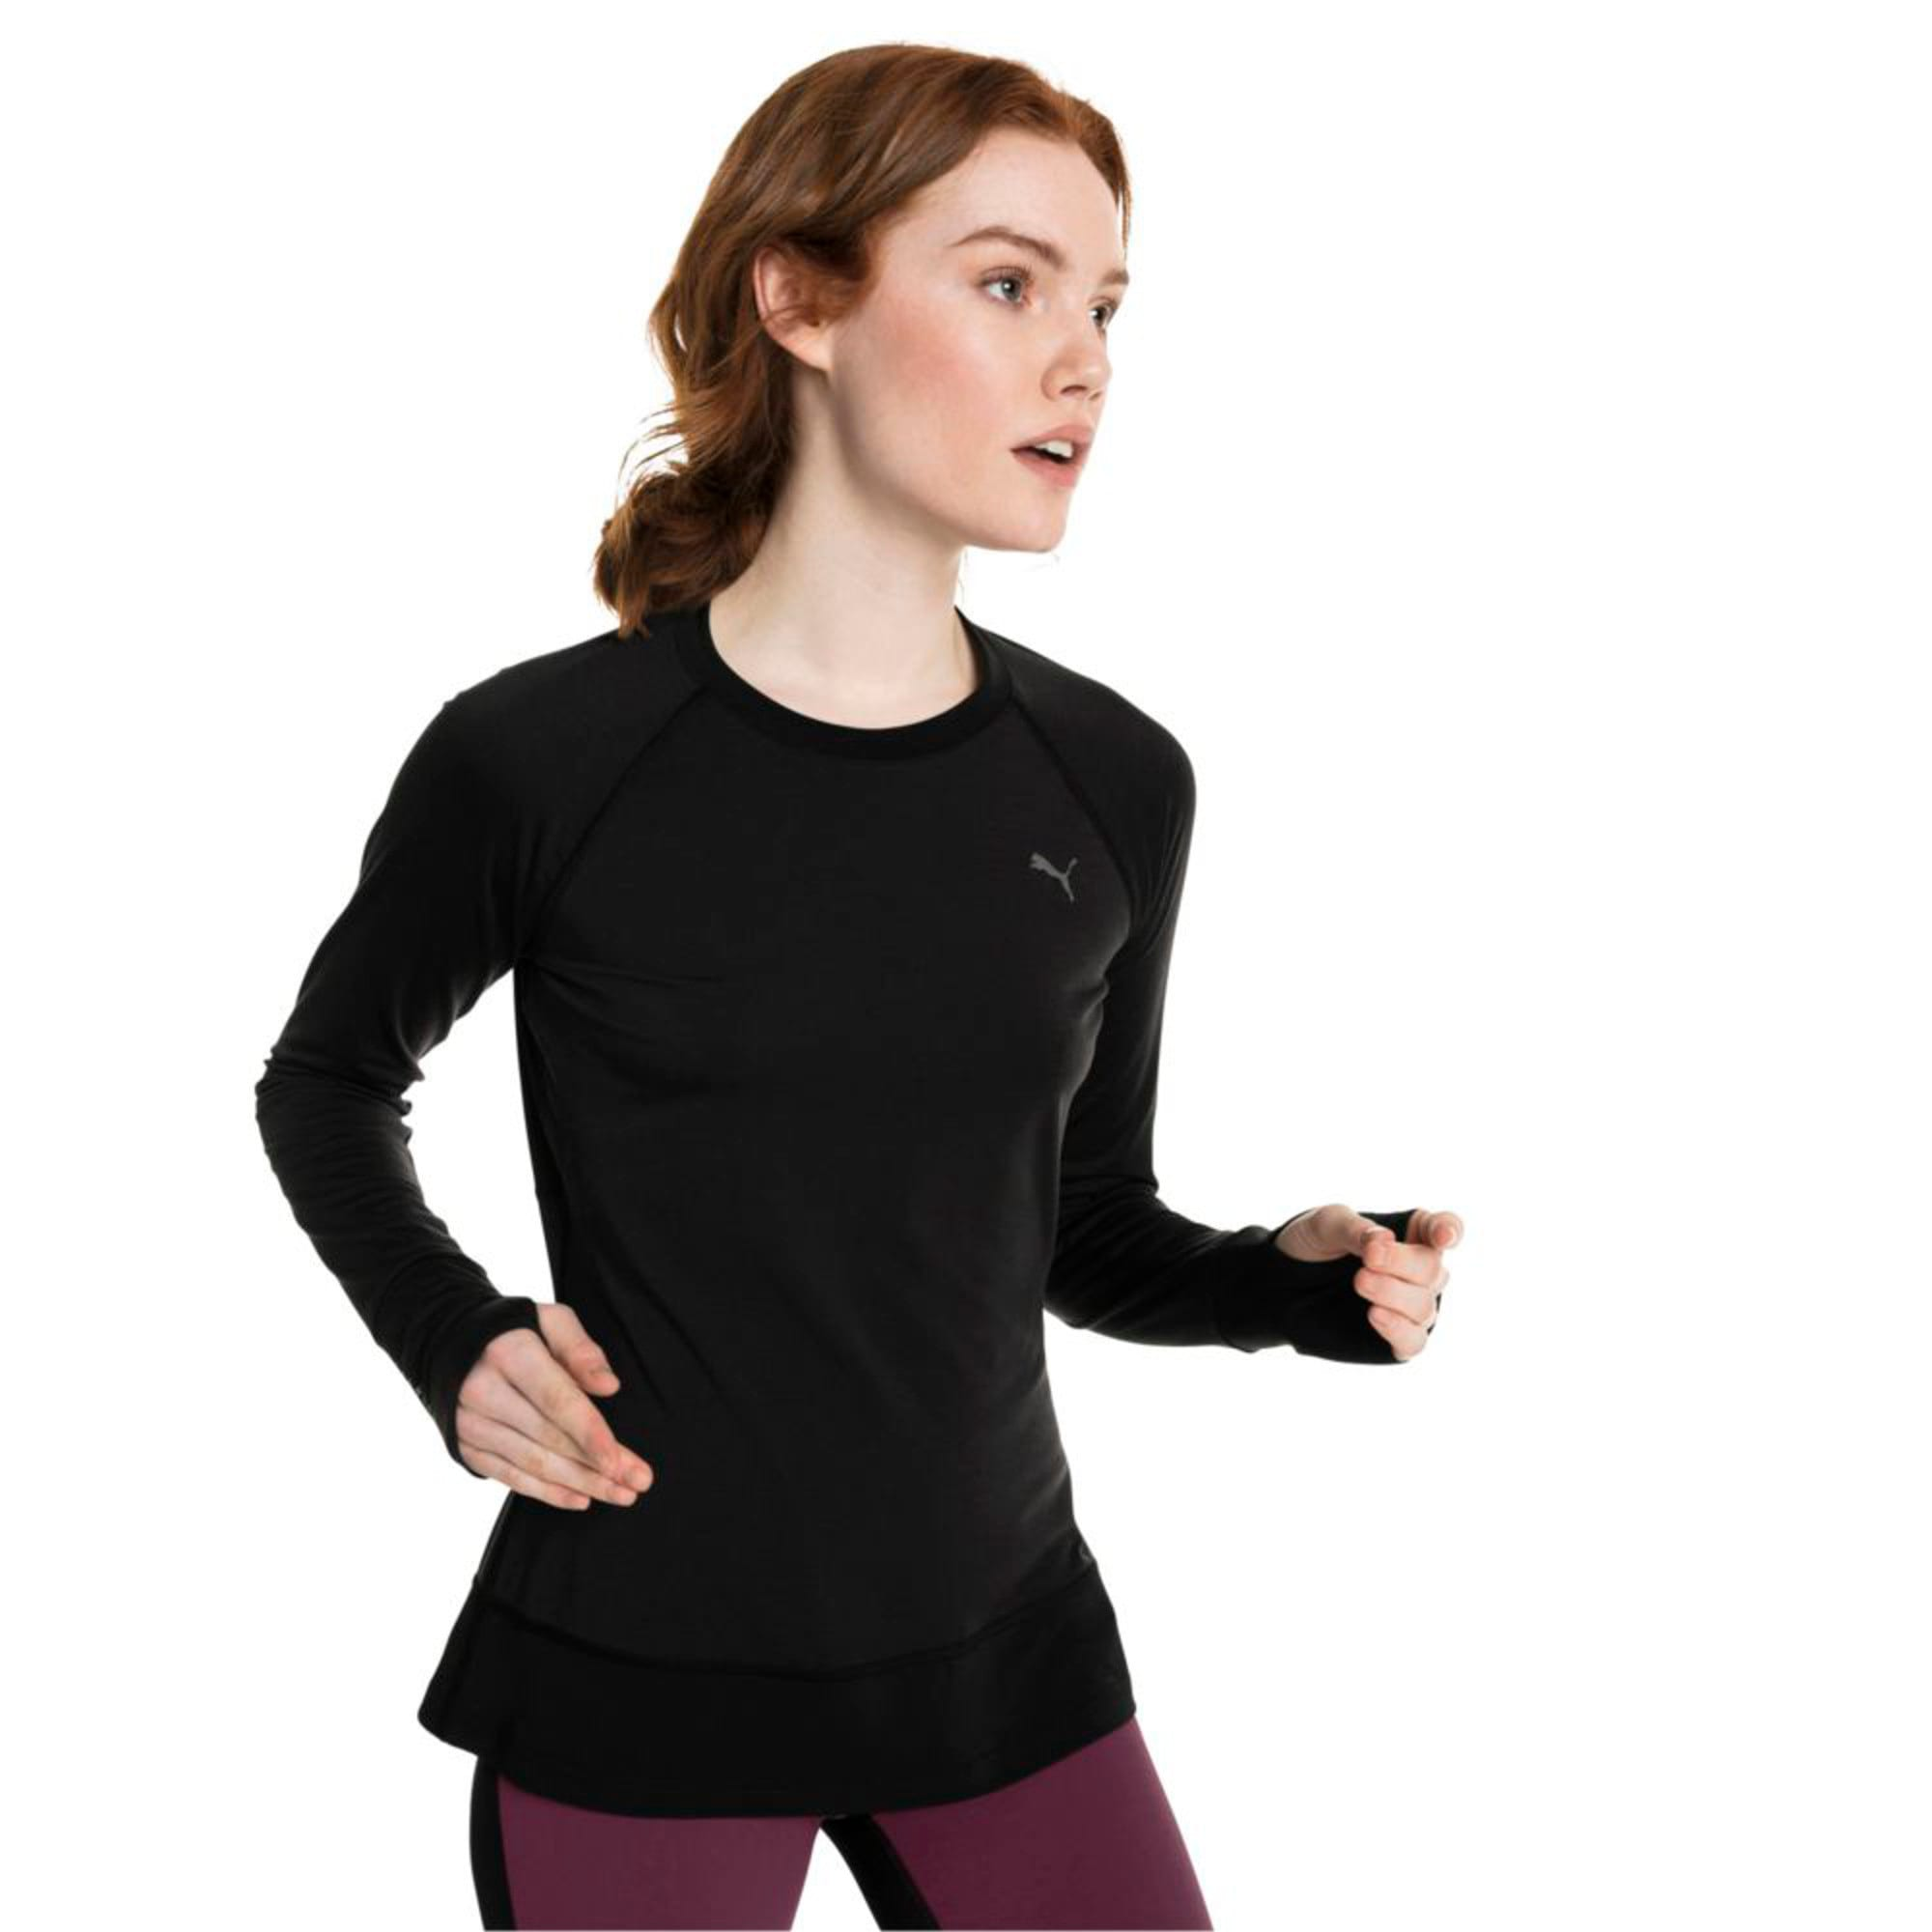 Thumbnail 1 of Winter Long Sleeve Women's Training Top, Puma Black, medium-IND